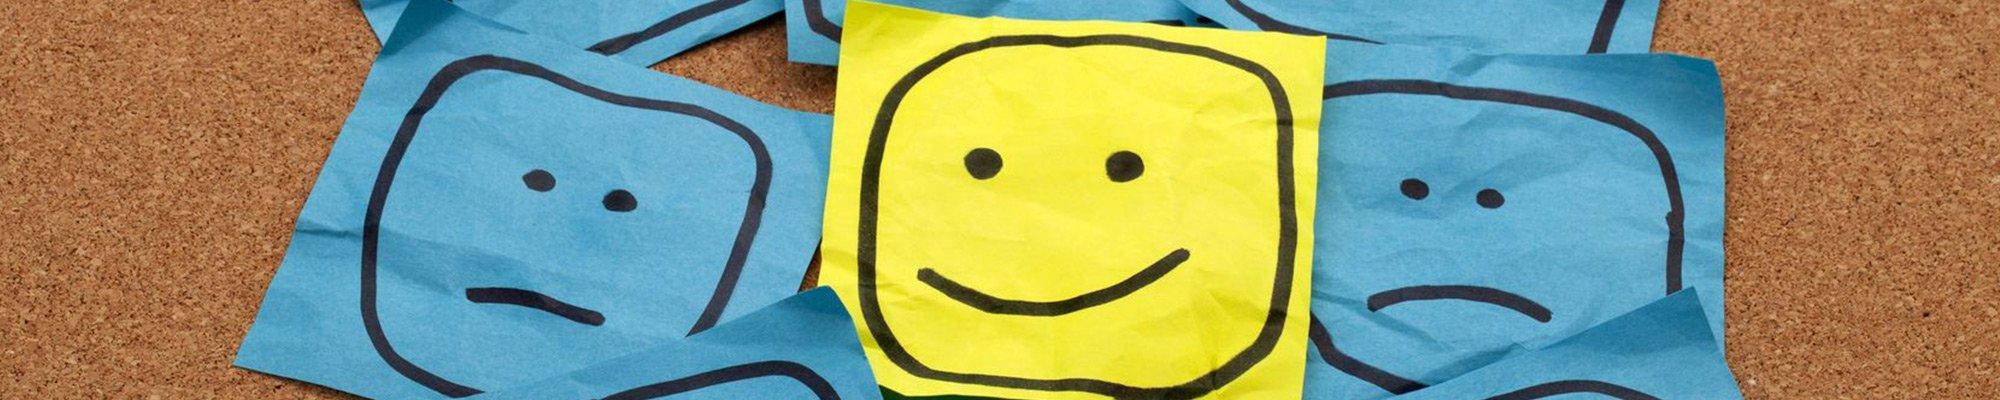 KPR News - Positive Attitude Article